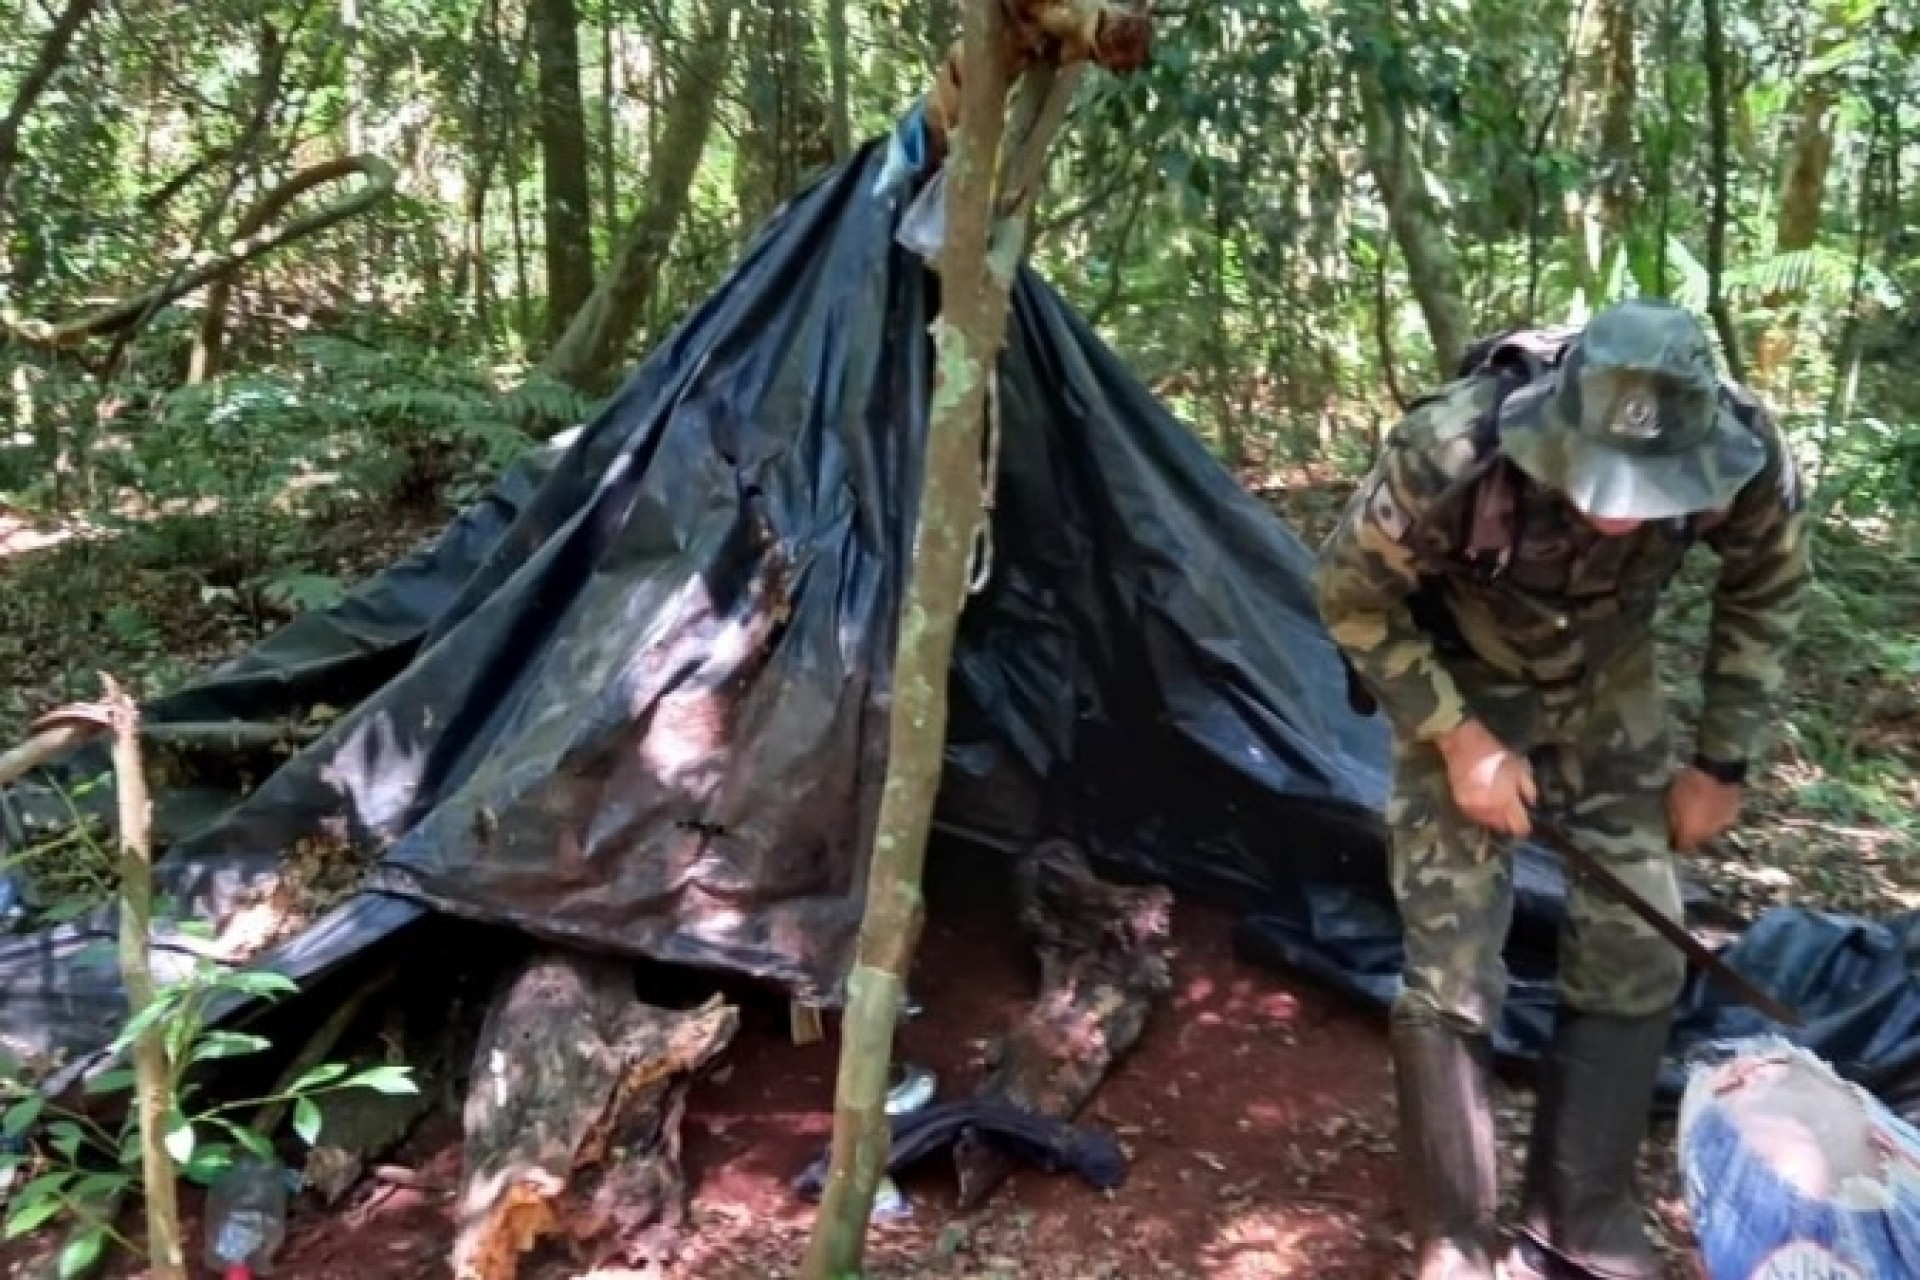 Polícia Ambiental destrói acampamentos dentro do Parque Nacional